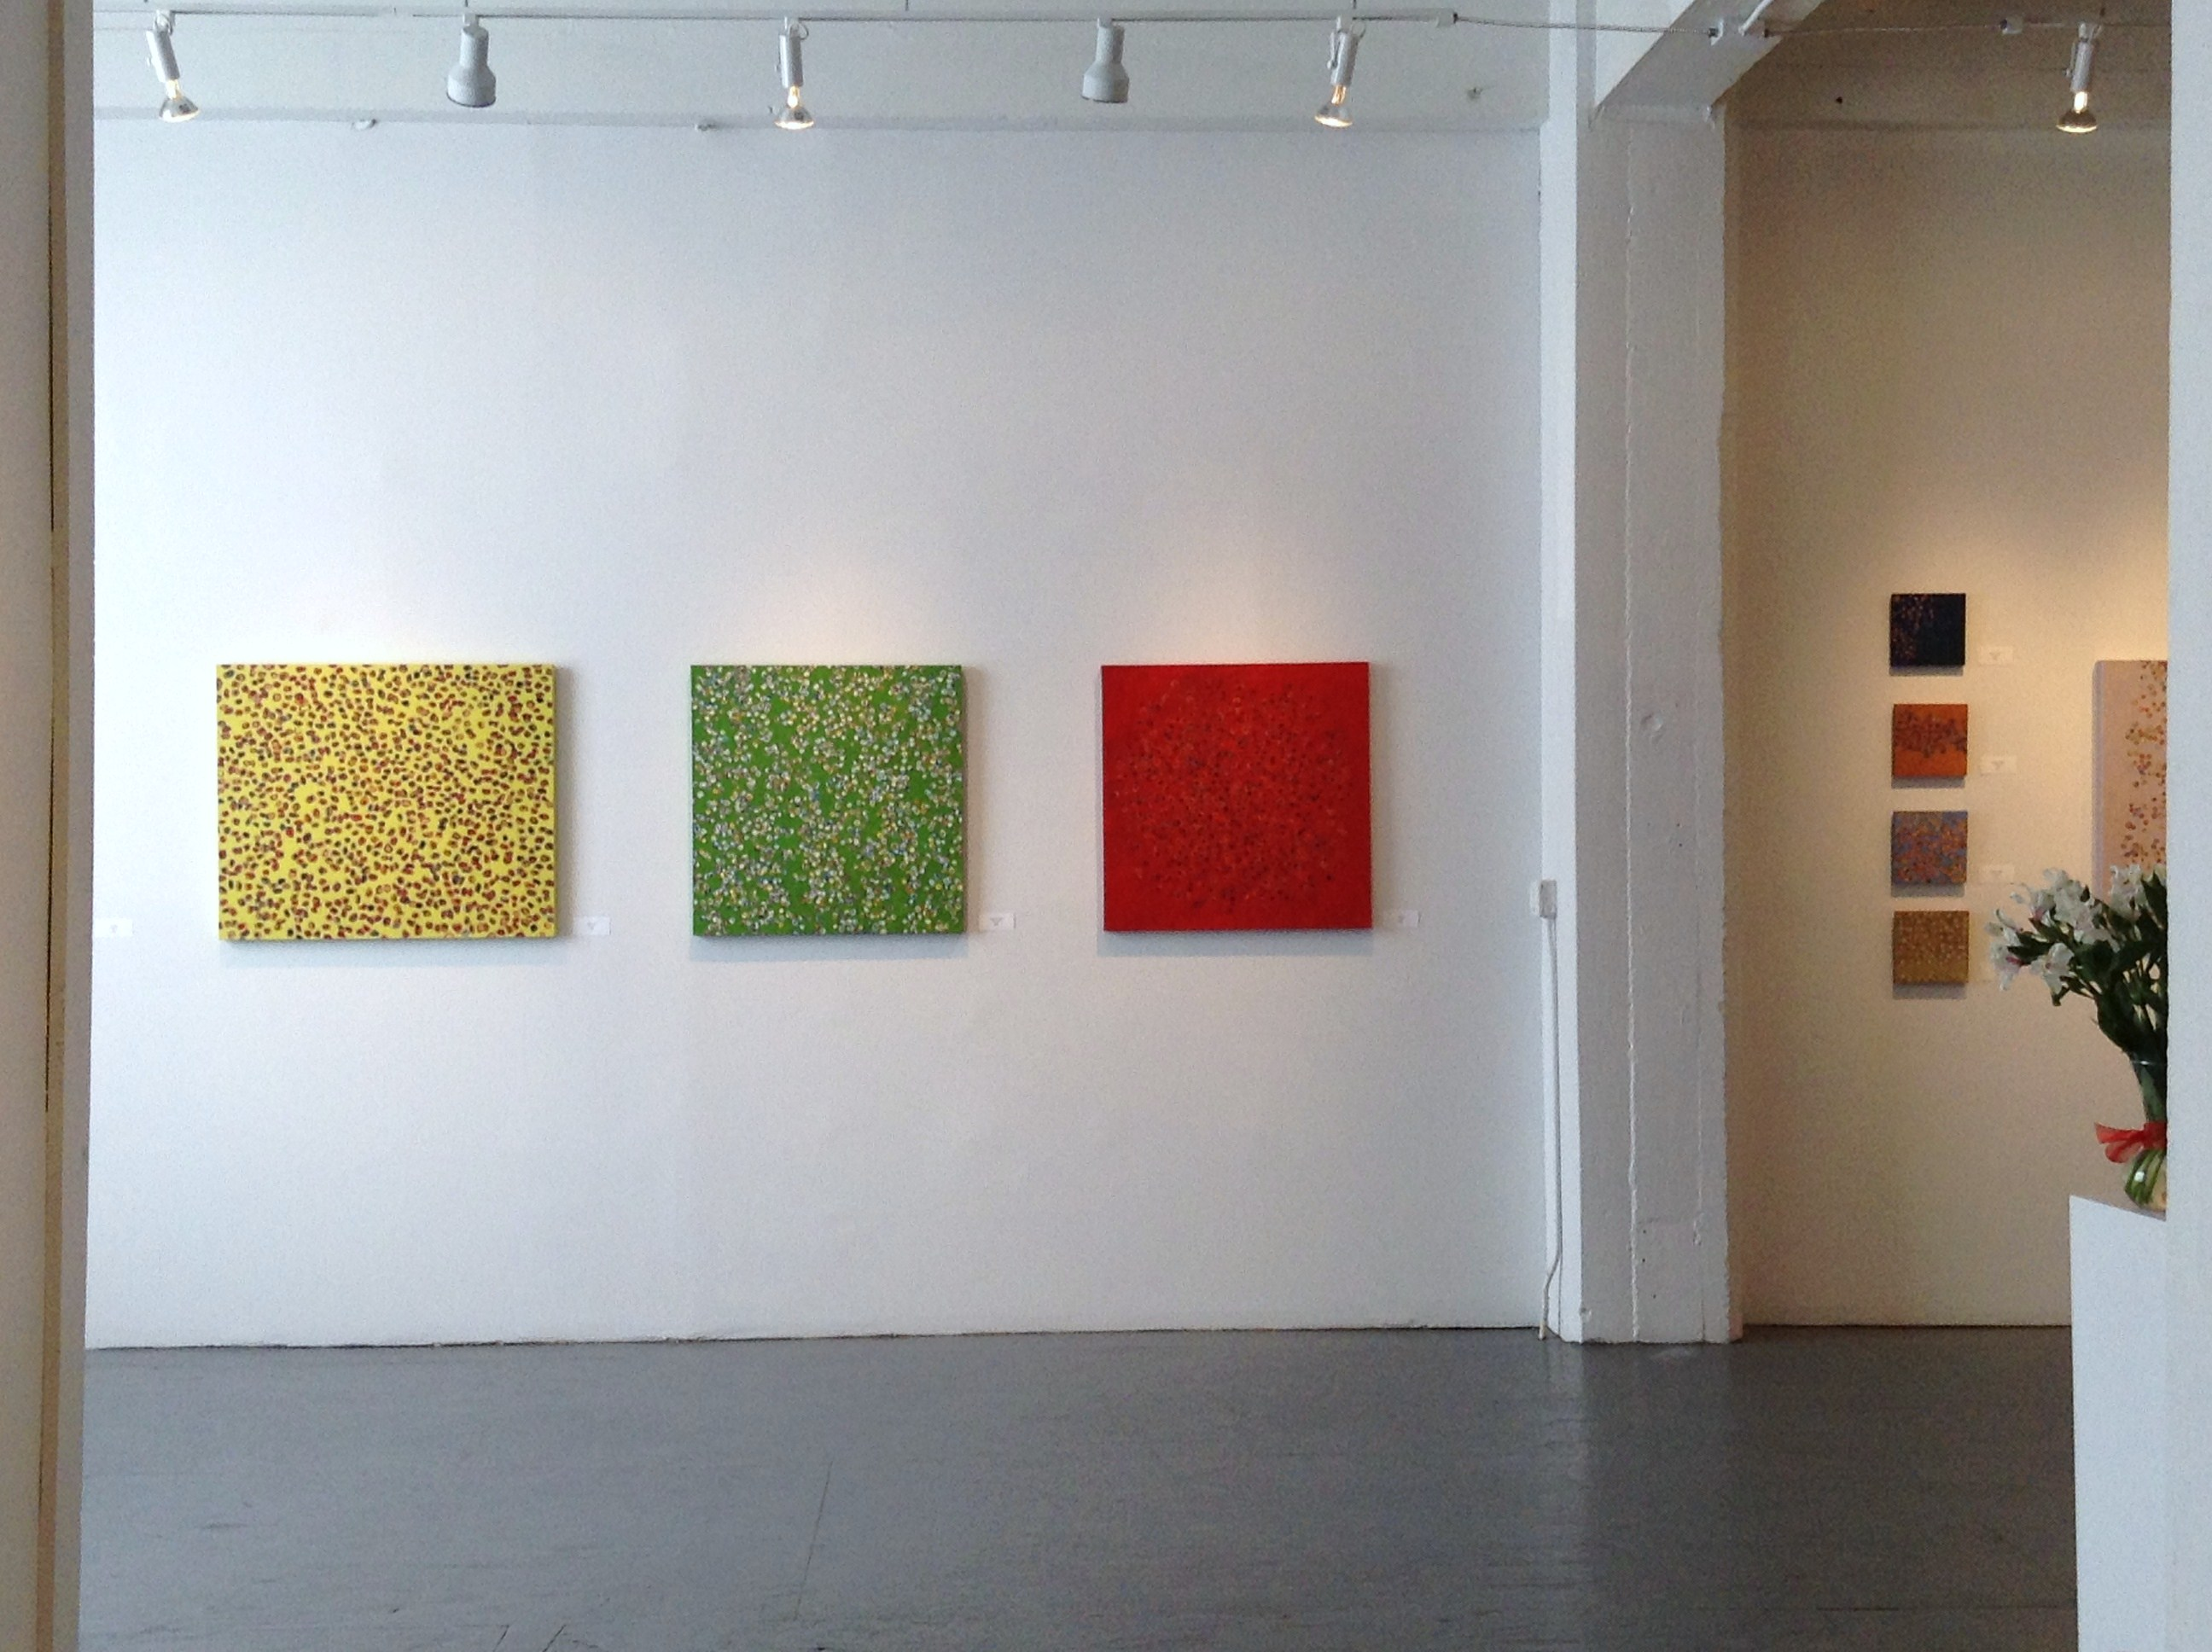 Installation view, on2gallery, California Building, NE Minneapolis